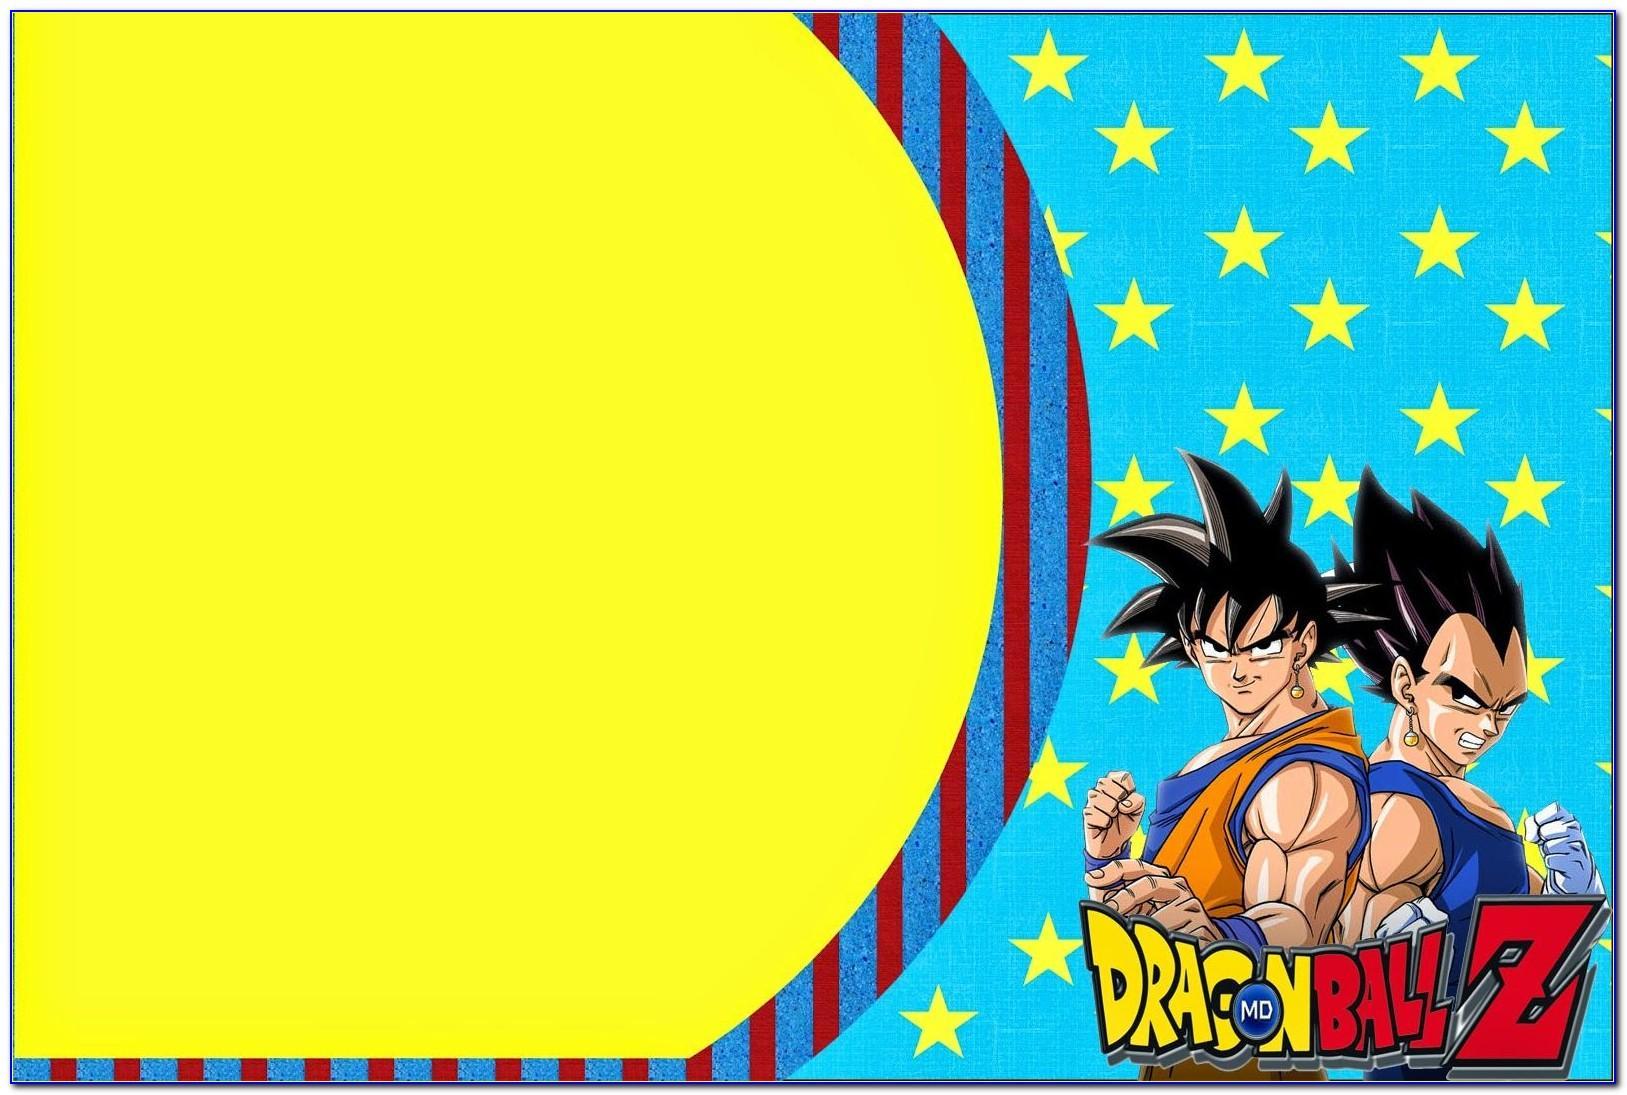 Dragon Ball Z Birthday Card Template